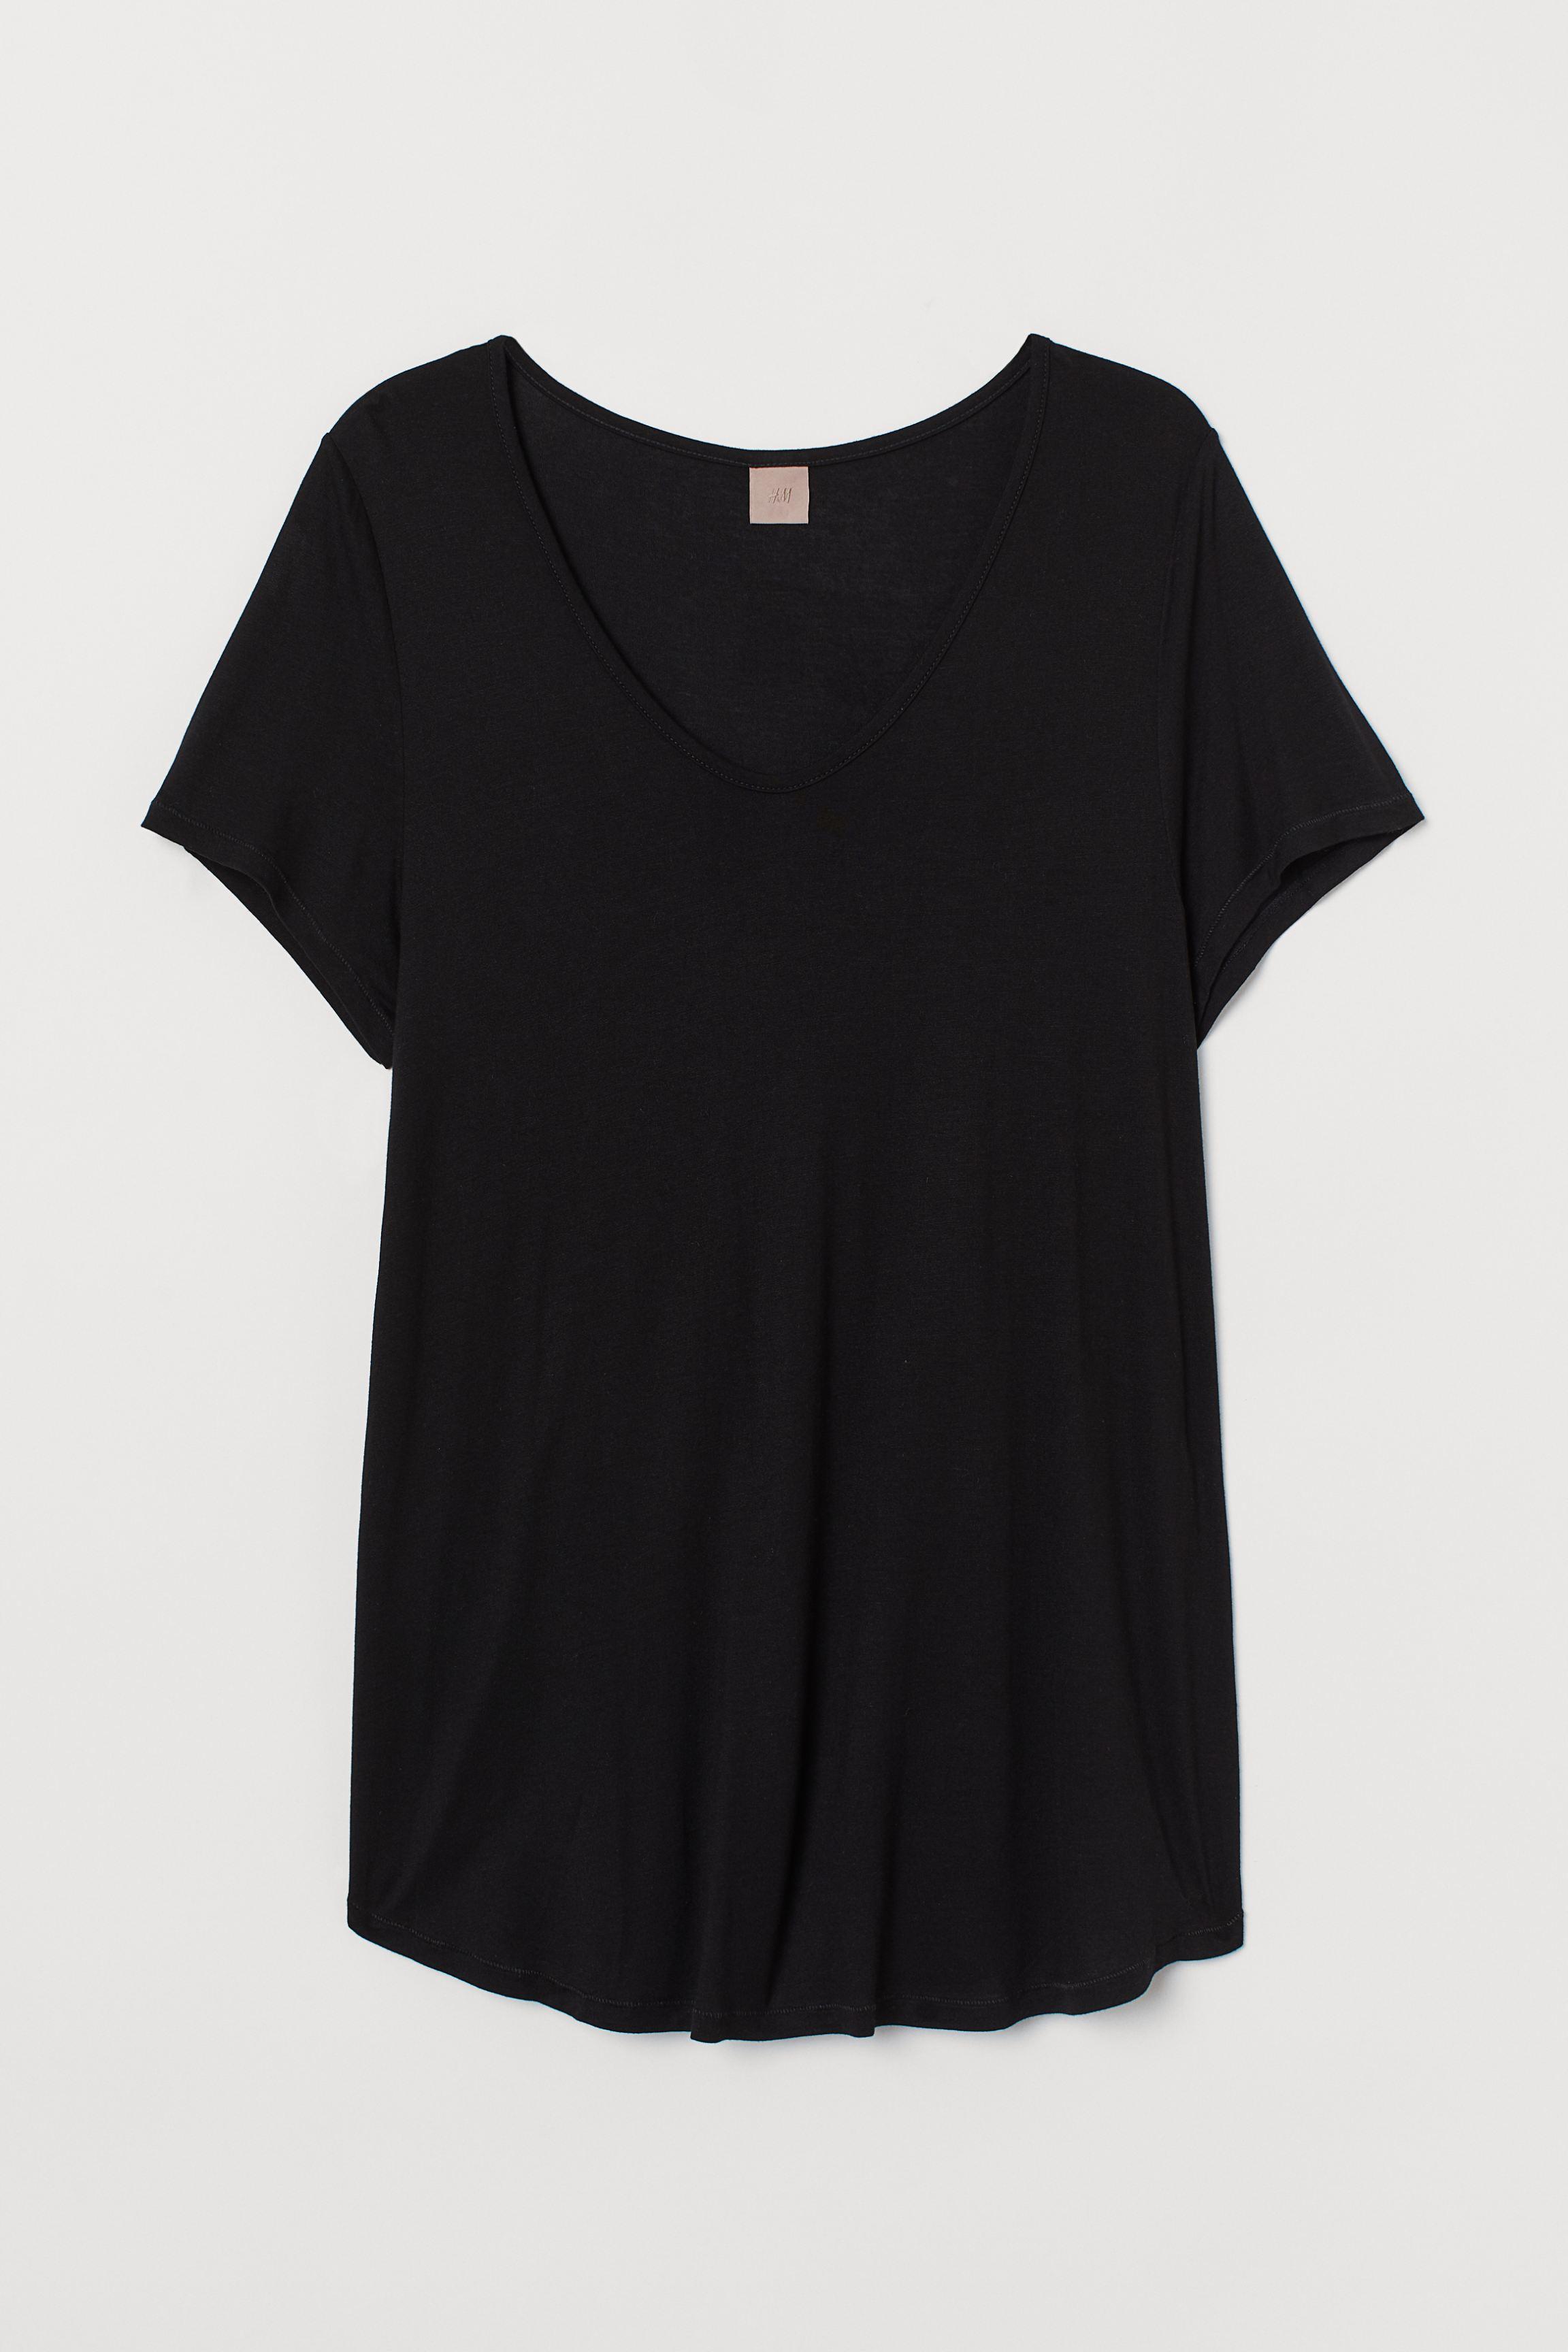 H&M+ Jersey Top